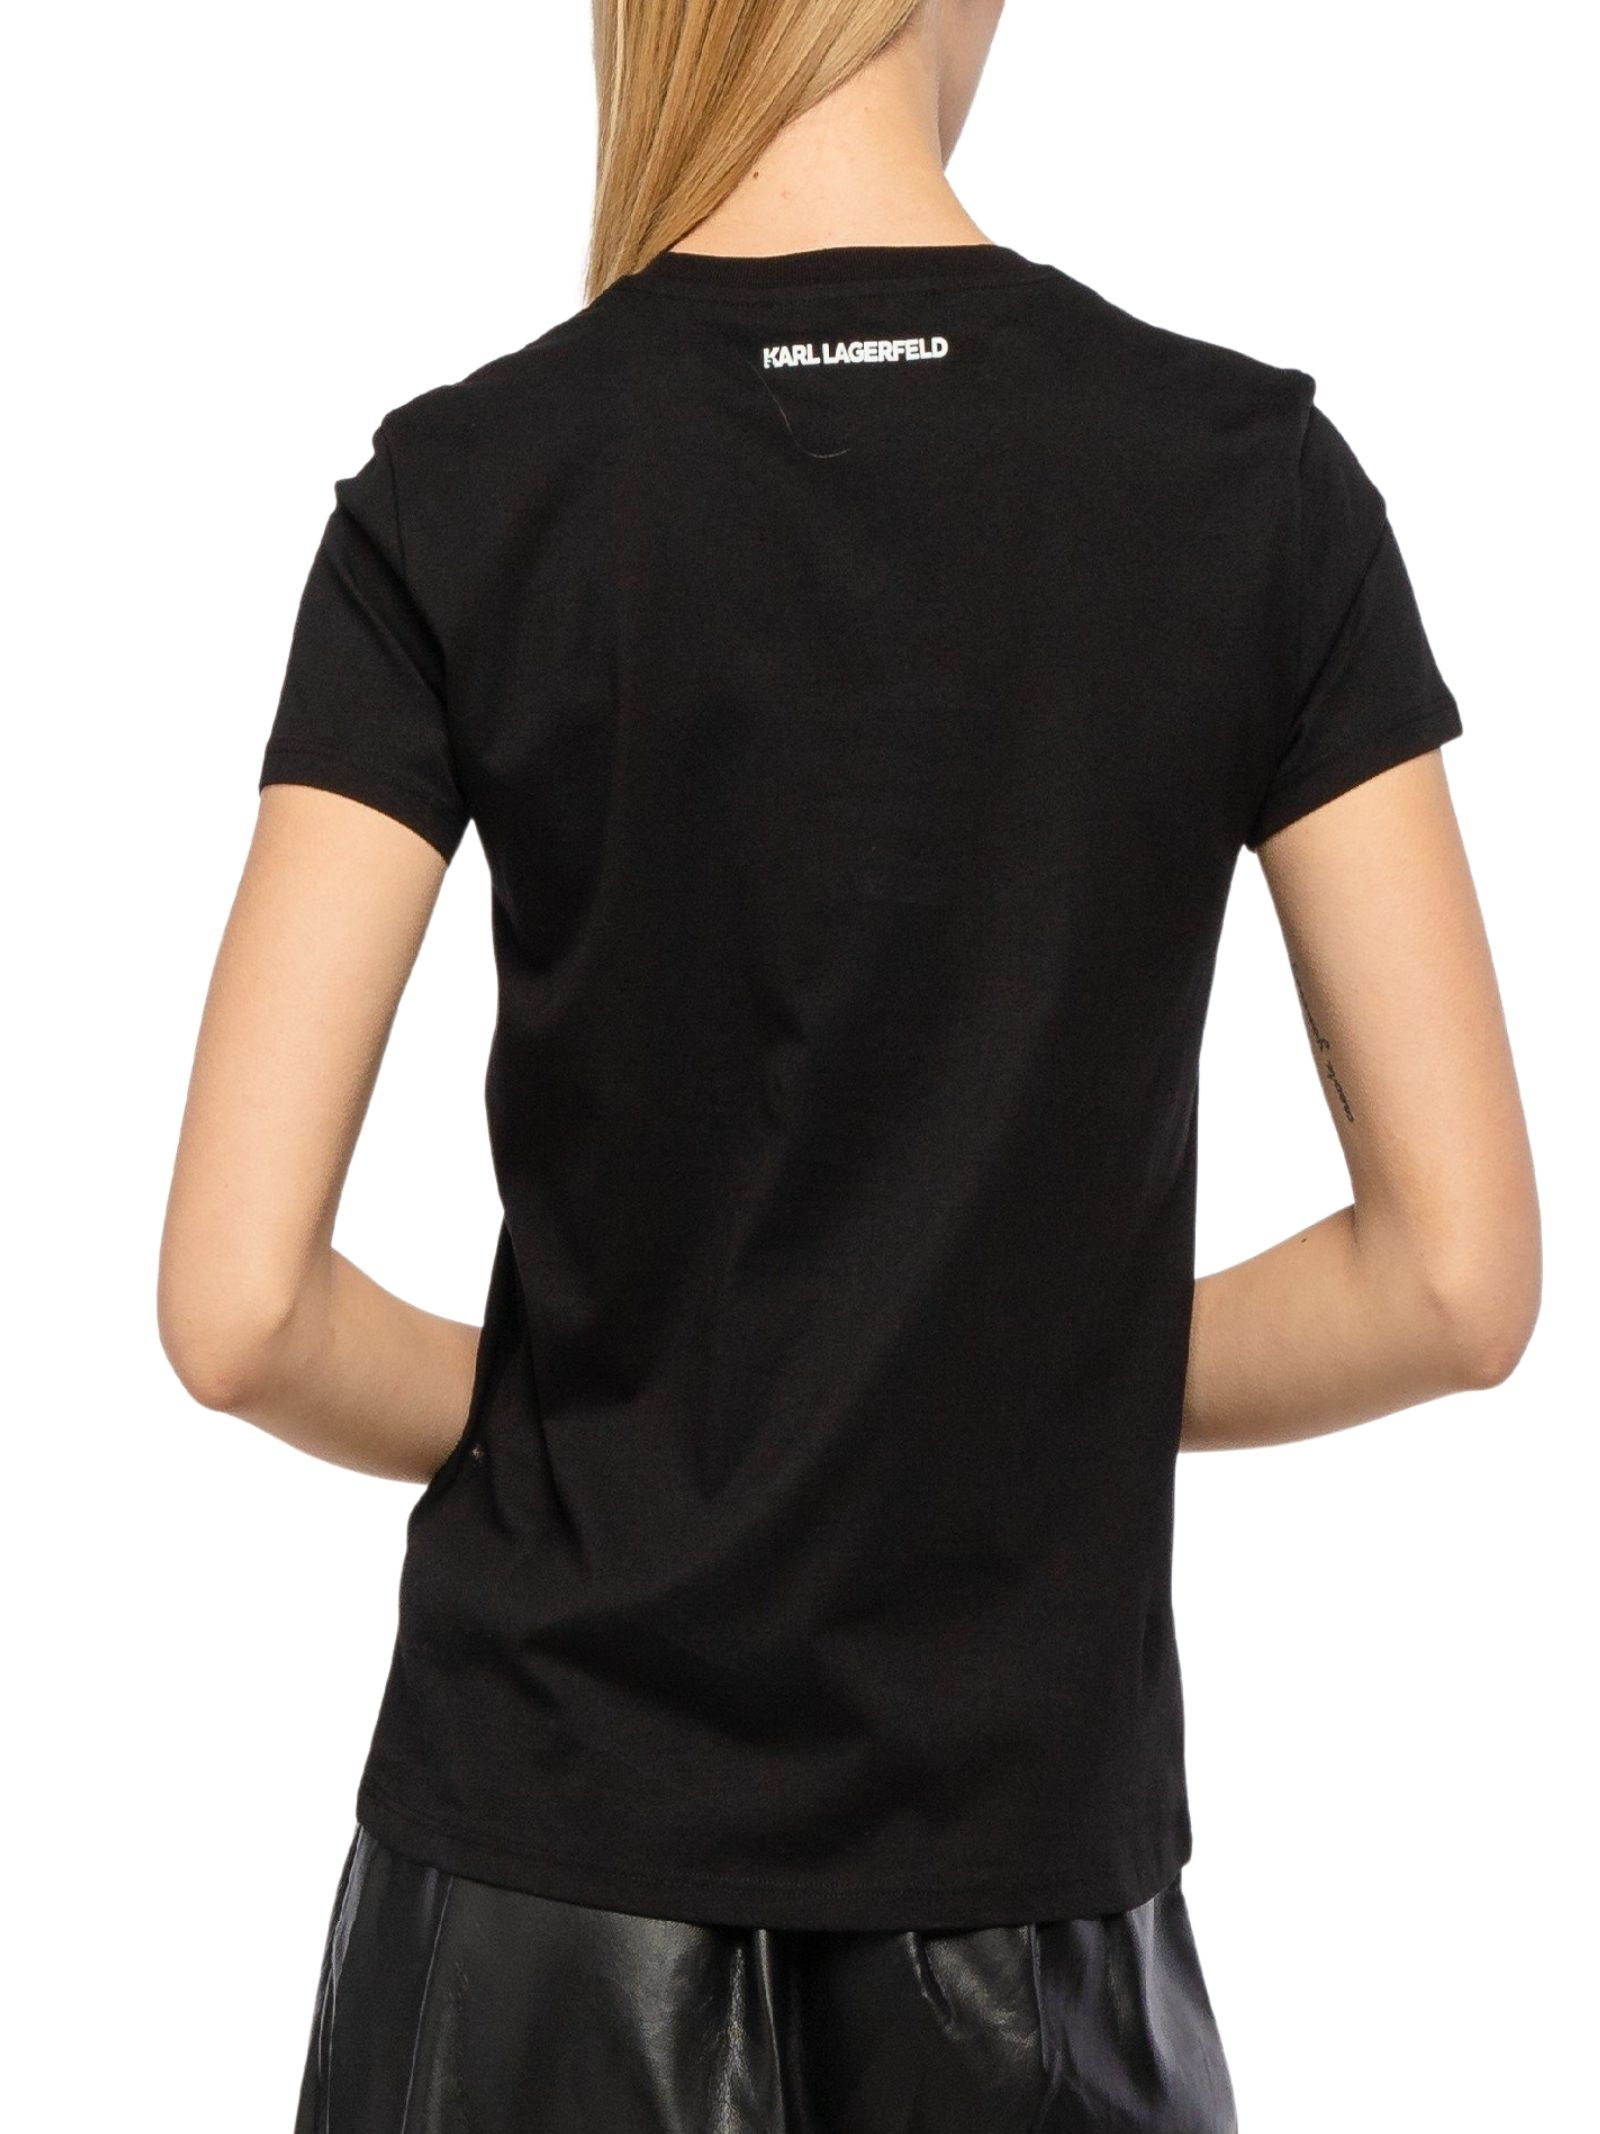 T-shirt neracon stampa KARL LAGERFELD | T-shirt | 210W1725.21999